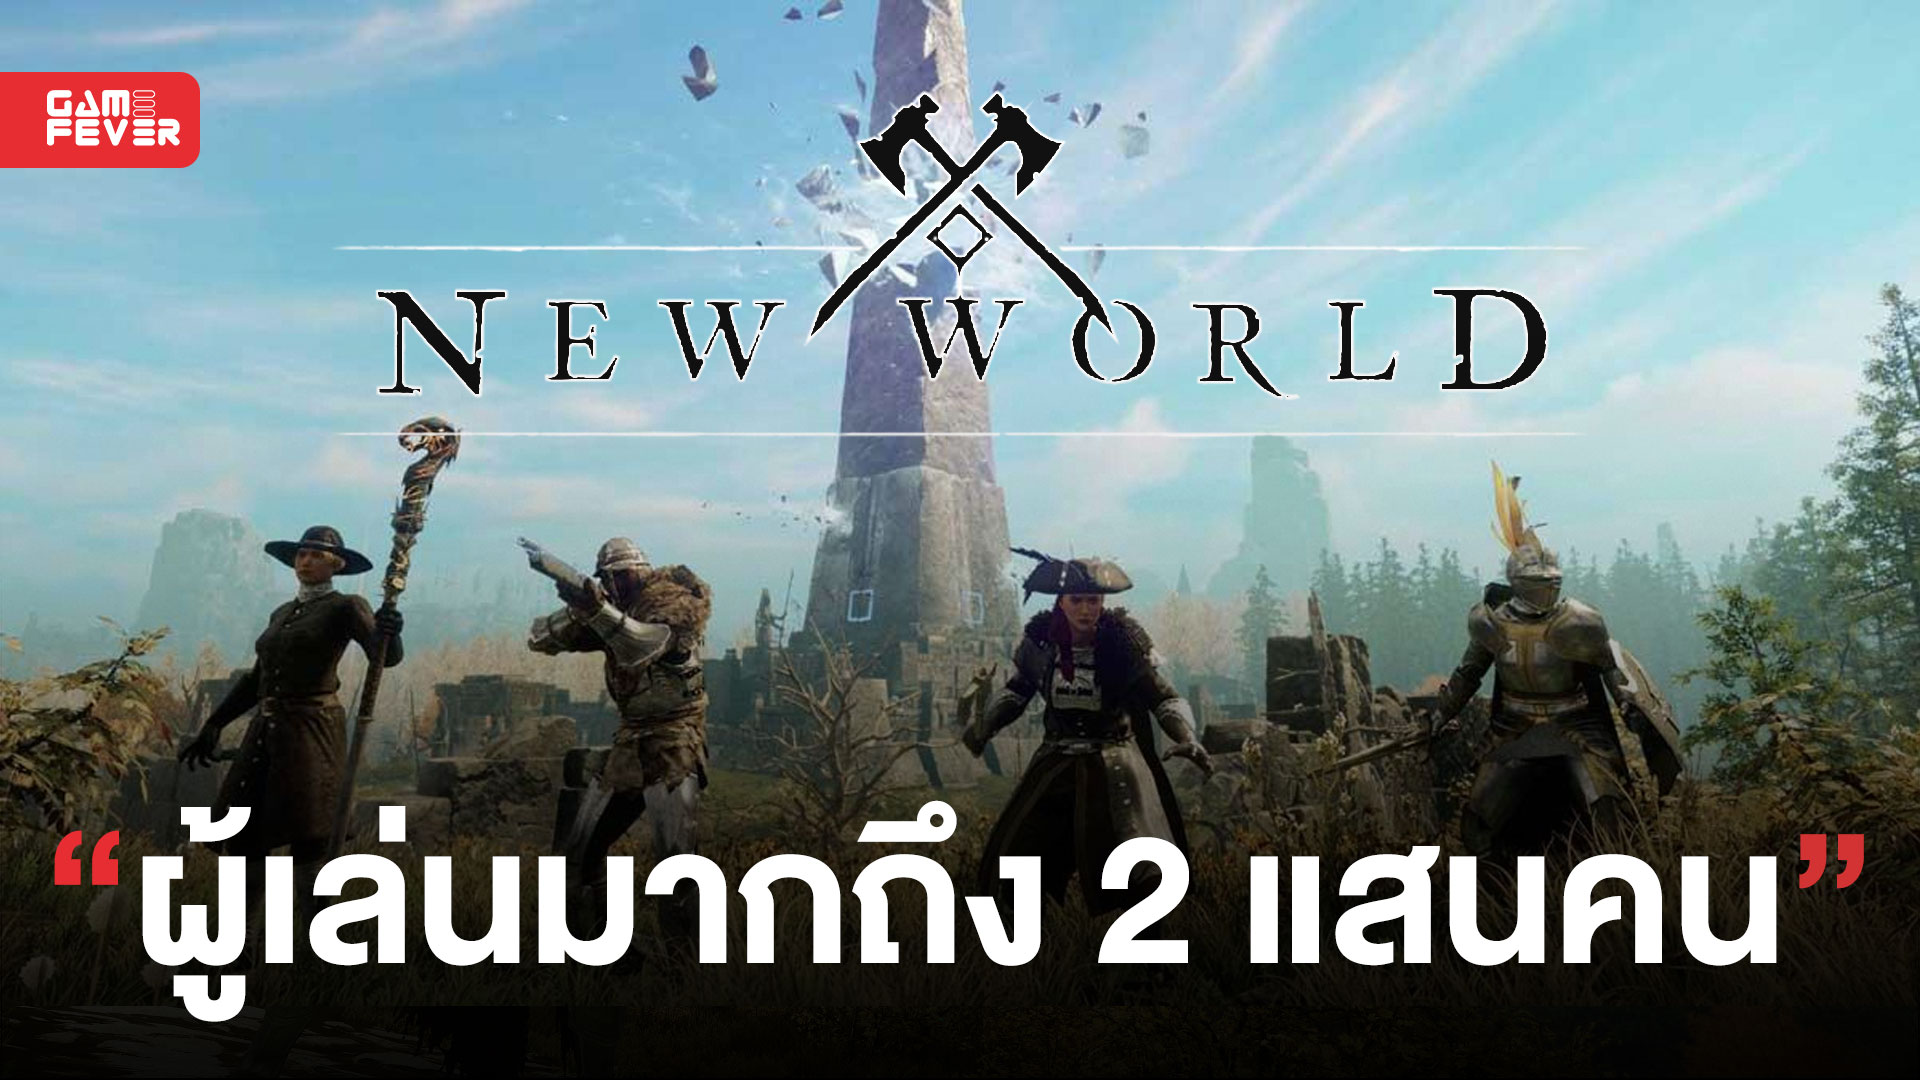 New World Beta มีคนเล่นเกมพร้อมกันมากกว่า 200,000 คนในวันที่เปิดให้เล่น